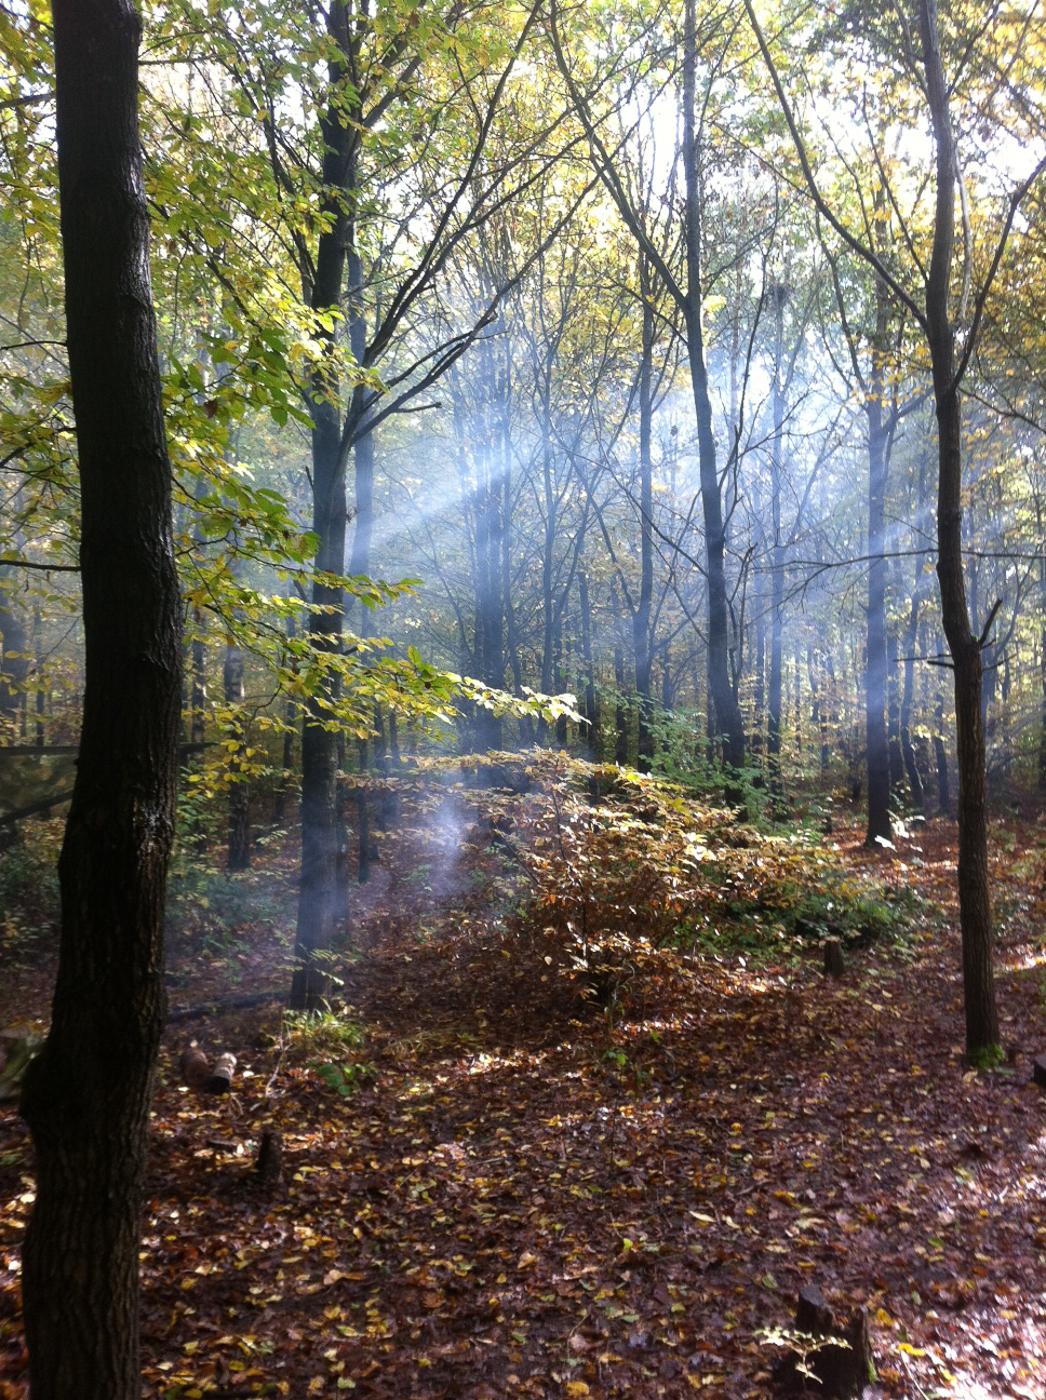 Third Place. Sunlight in Howe Park Wood by Arthur Allen